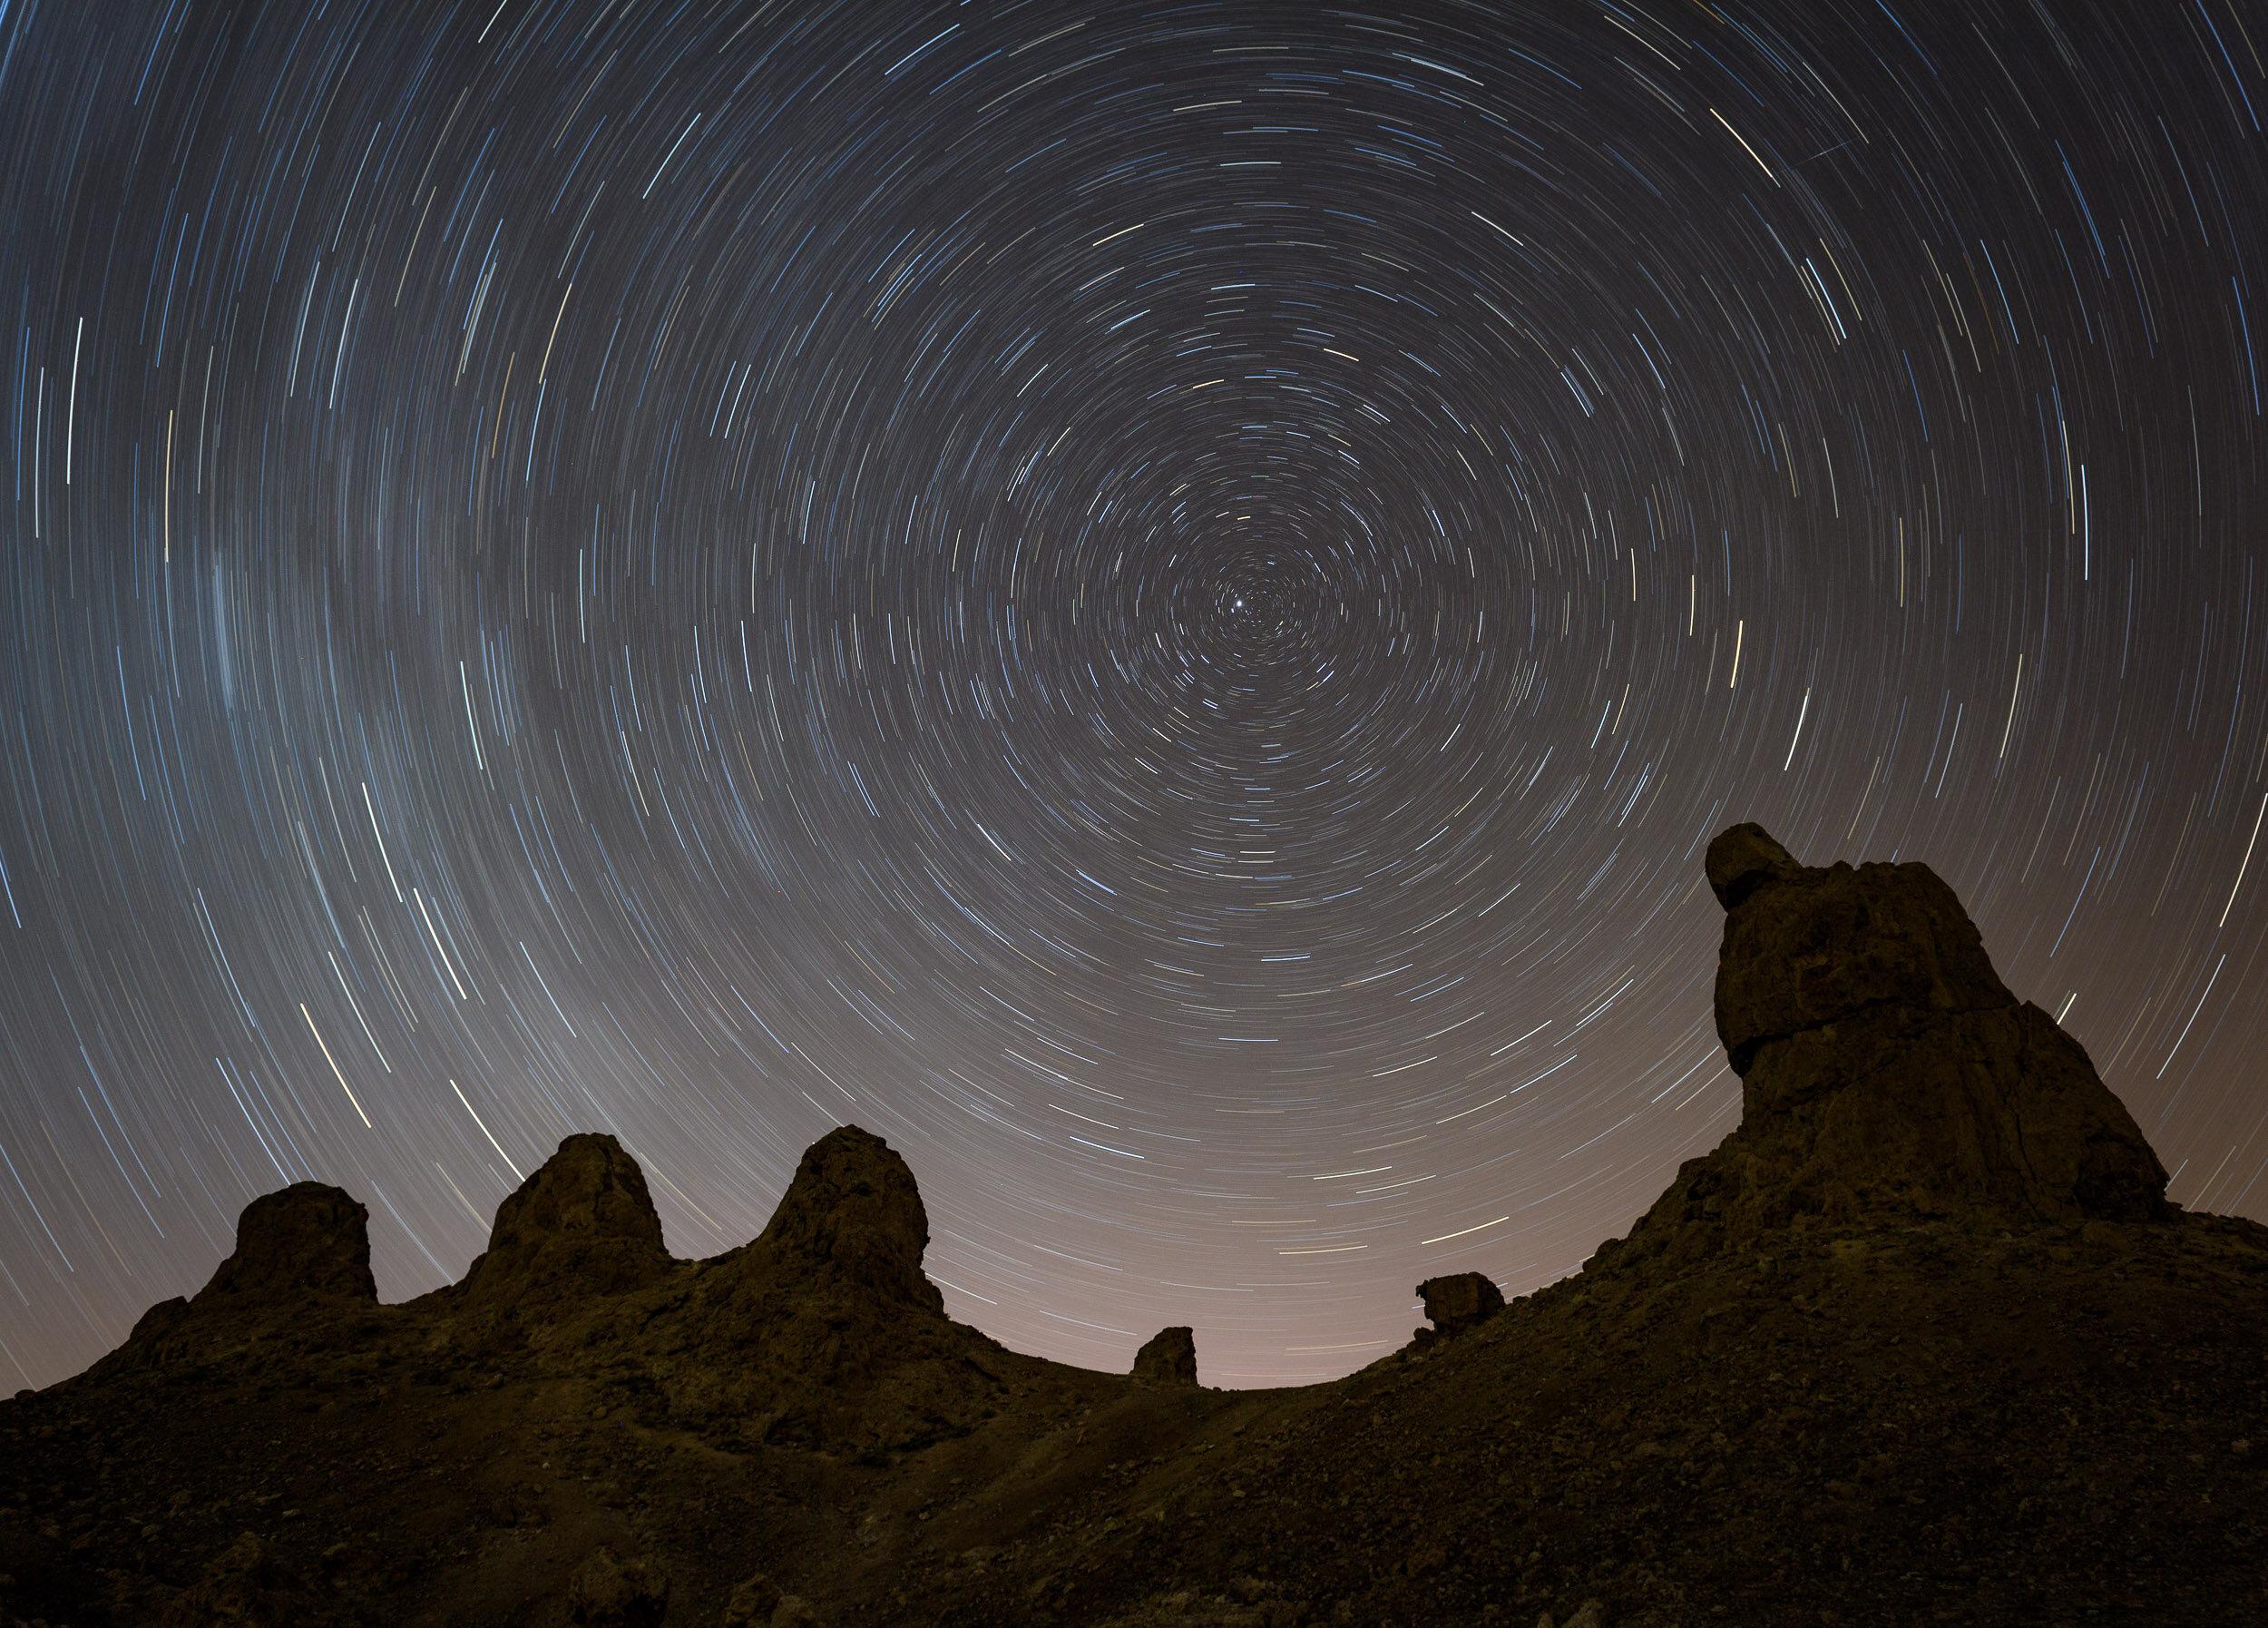 Star Circles over Trona Pinnacles, California. Nikon D5 with a Nikon 24-70mm f/2.8 lens. 31 minutes, f/4, ISO 100.